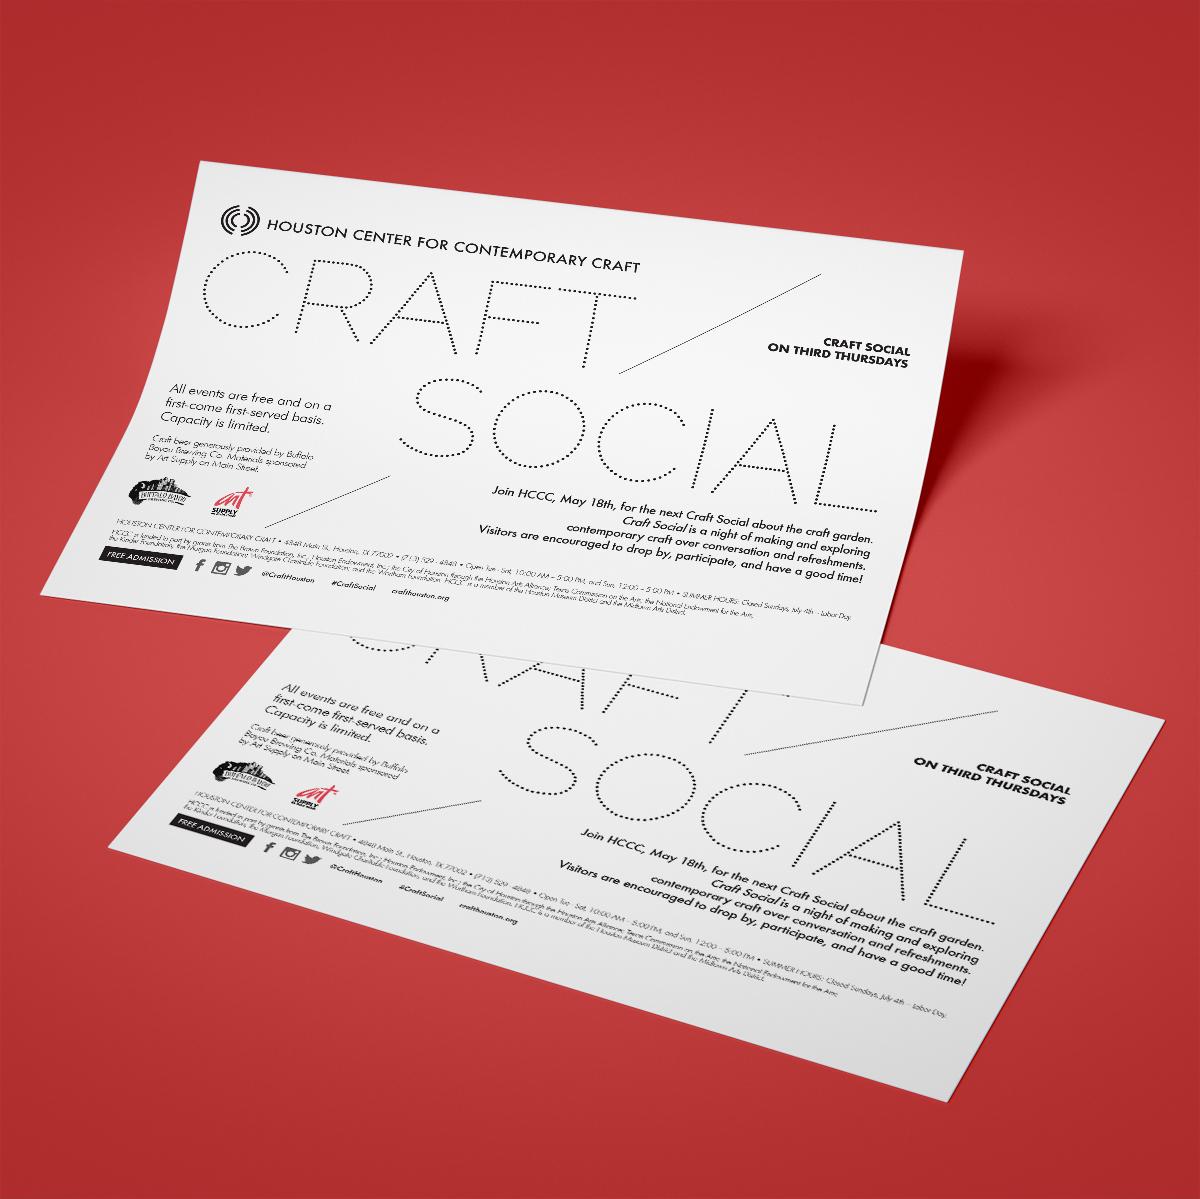 HCCC-Craft-Social-Flyer-Presentation-1200px.jpg